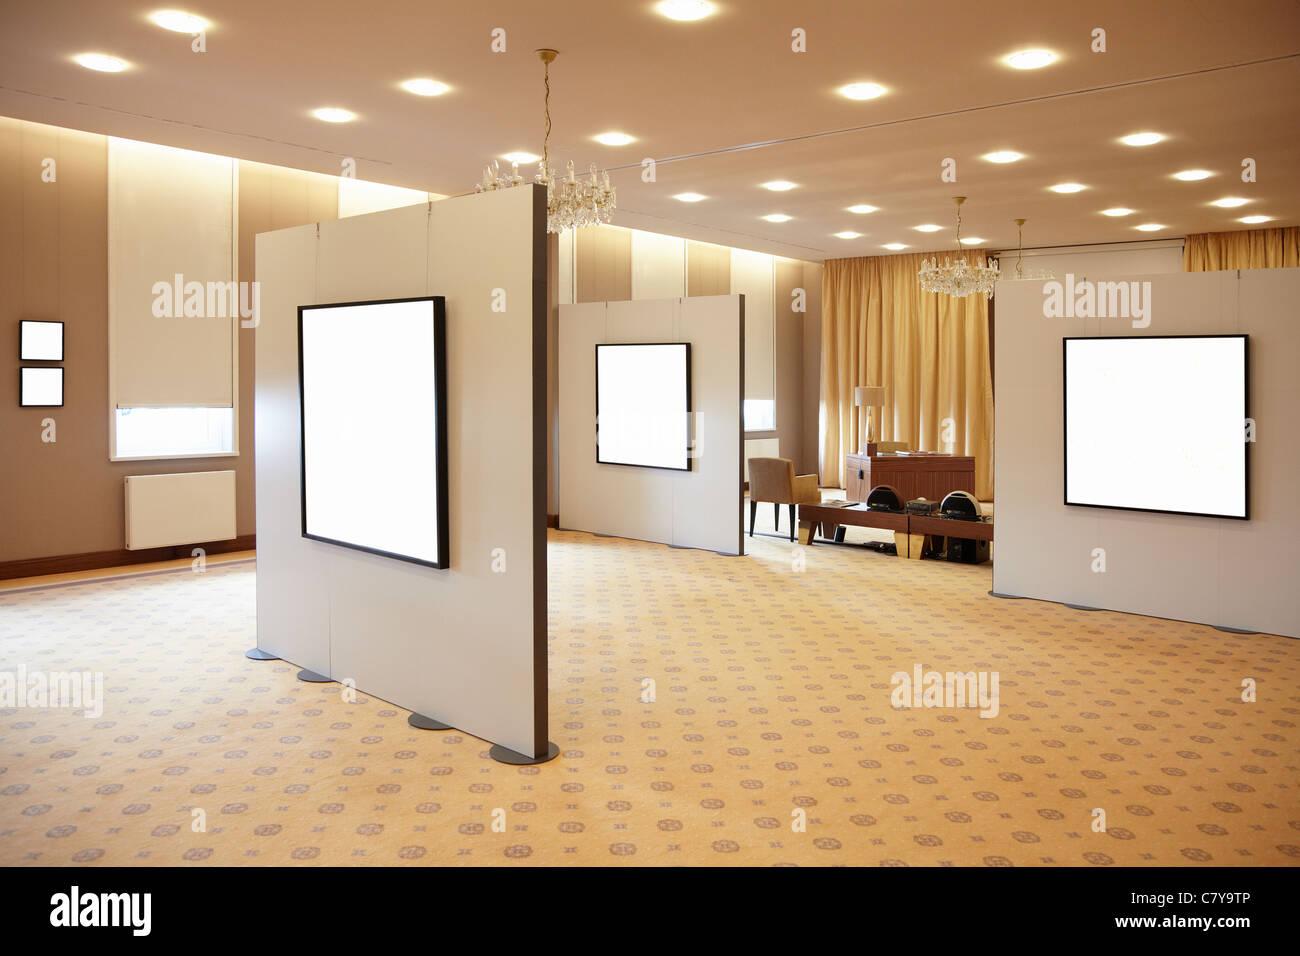 Blank white frames in art gallery interior - Stock Image